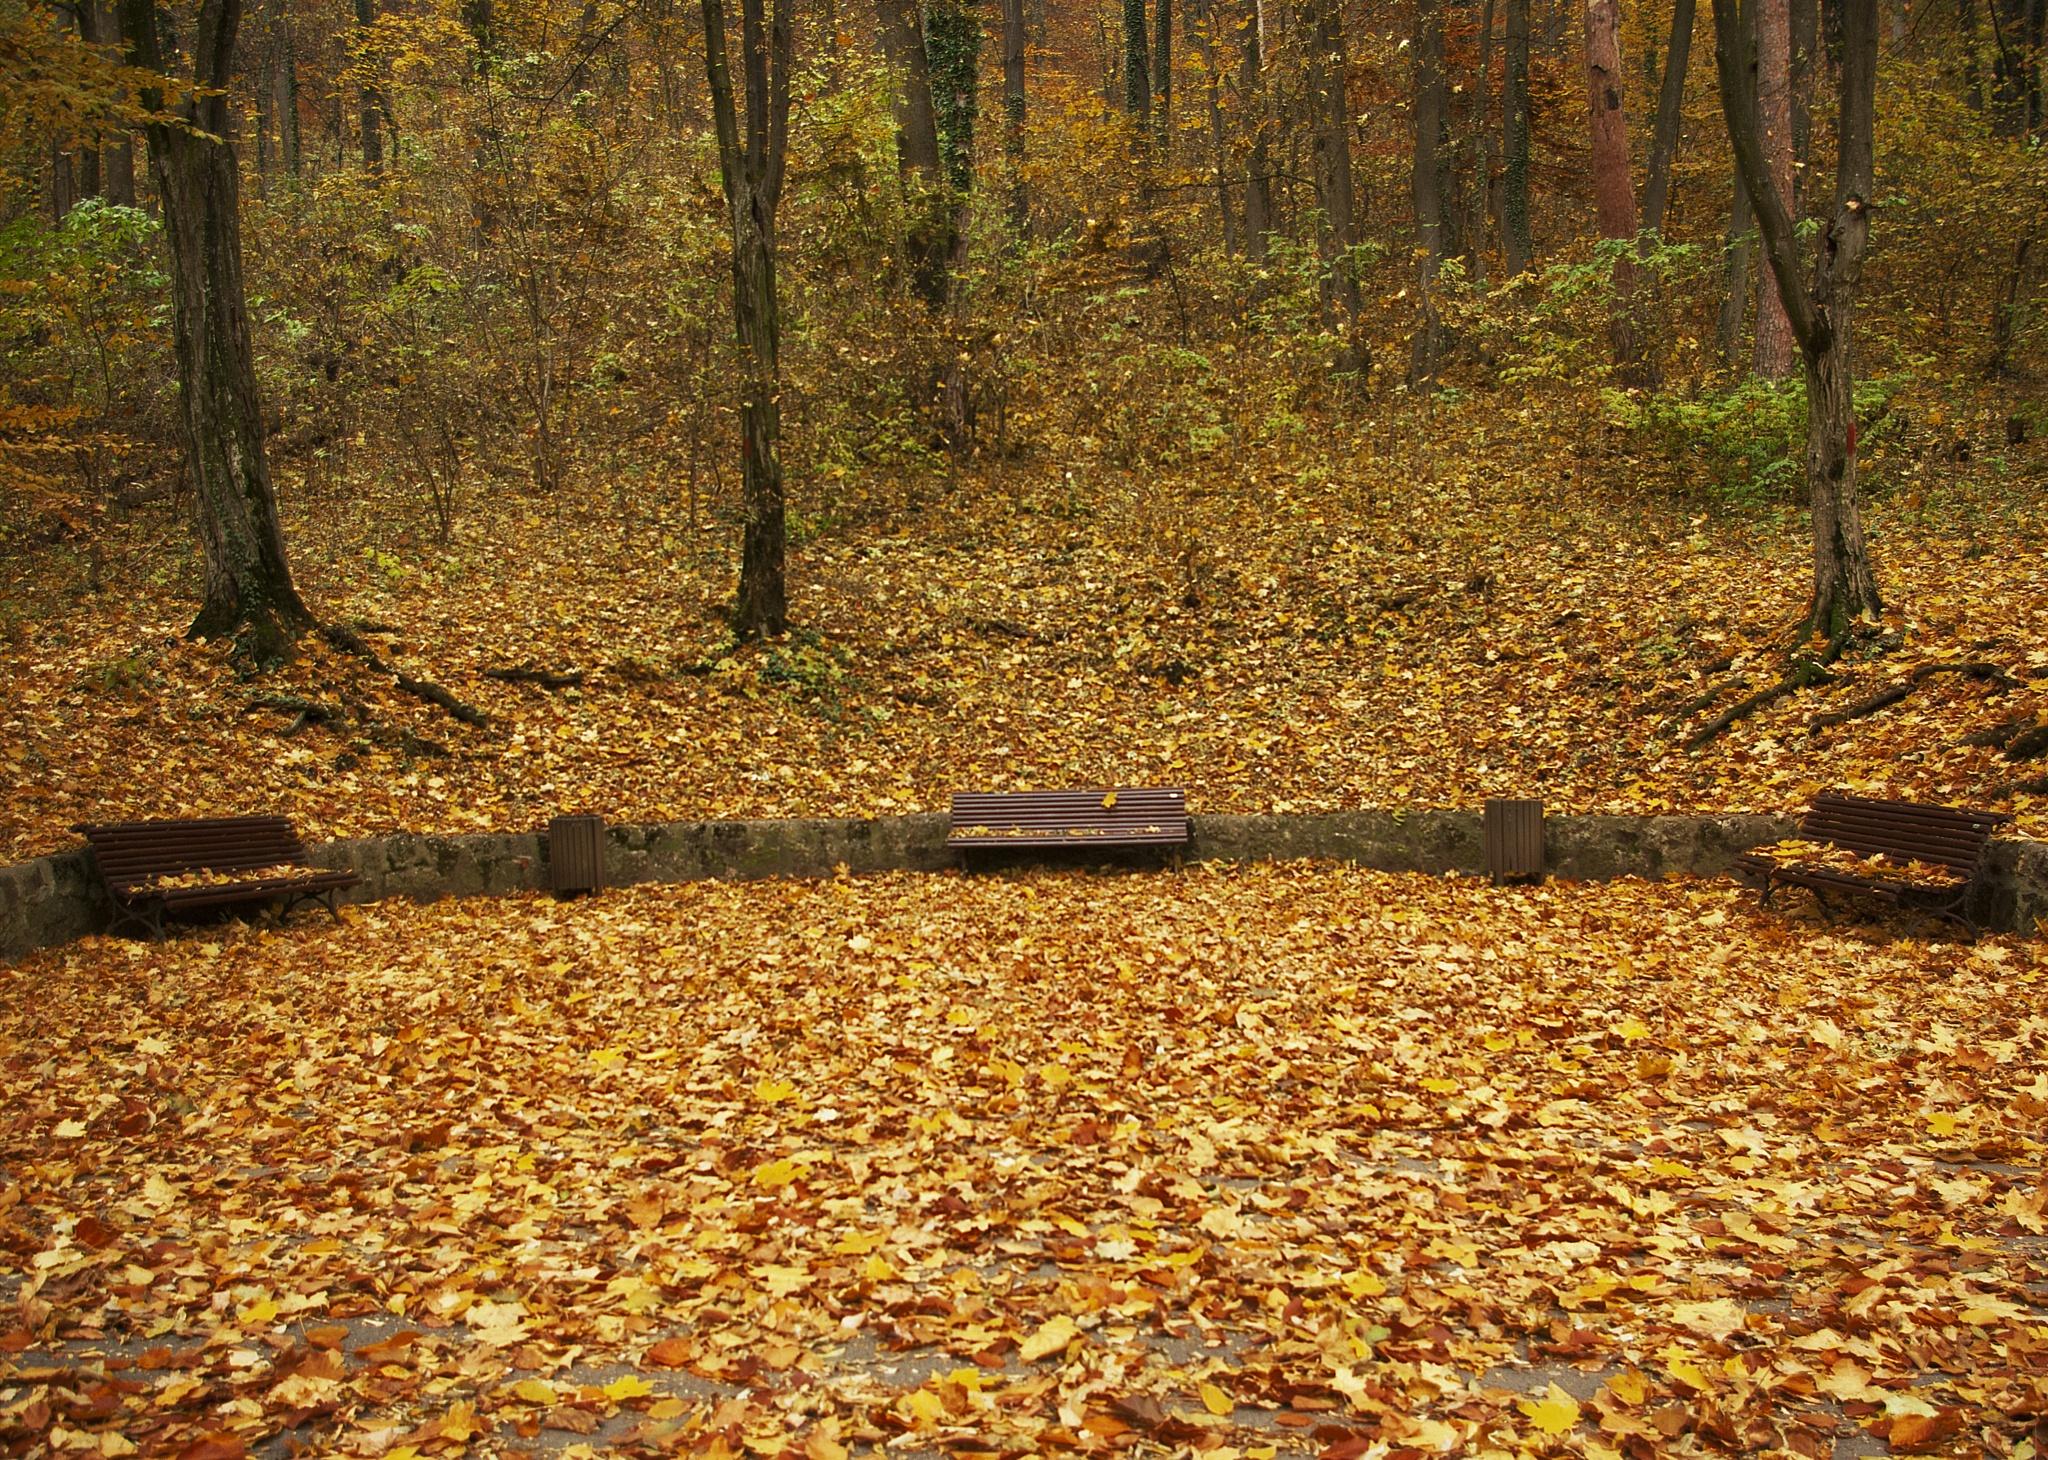 autumn 01 by leonard.petraru